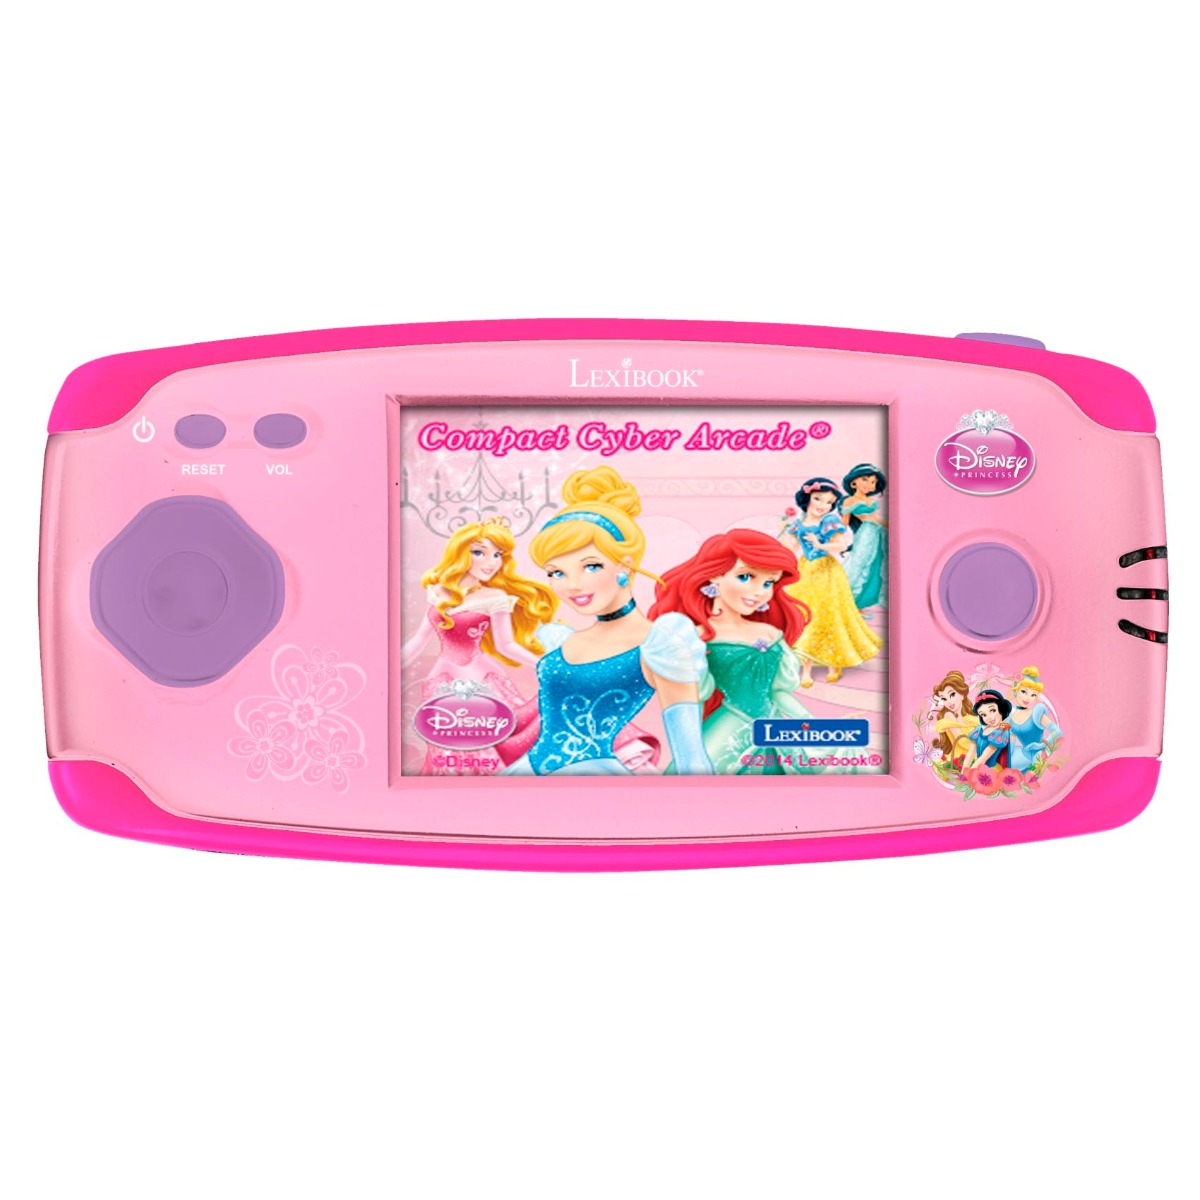 Consola portabila Cyber Arcade Disney Princess, 150 jocuri